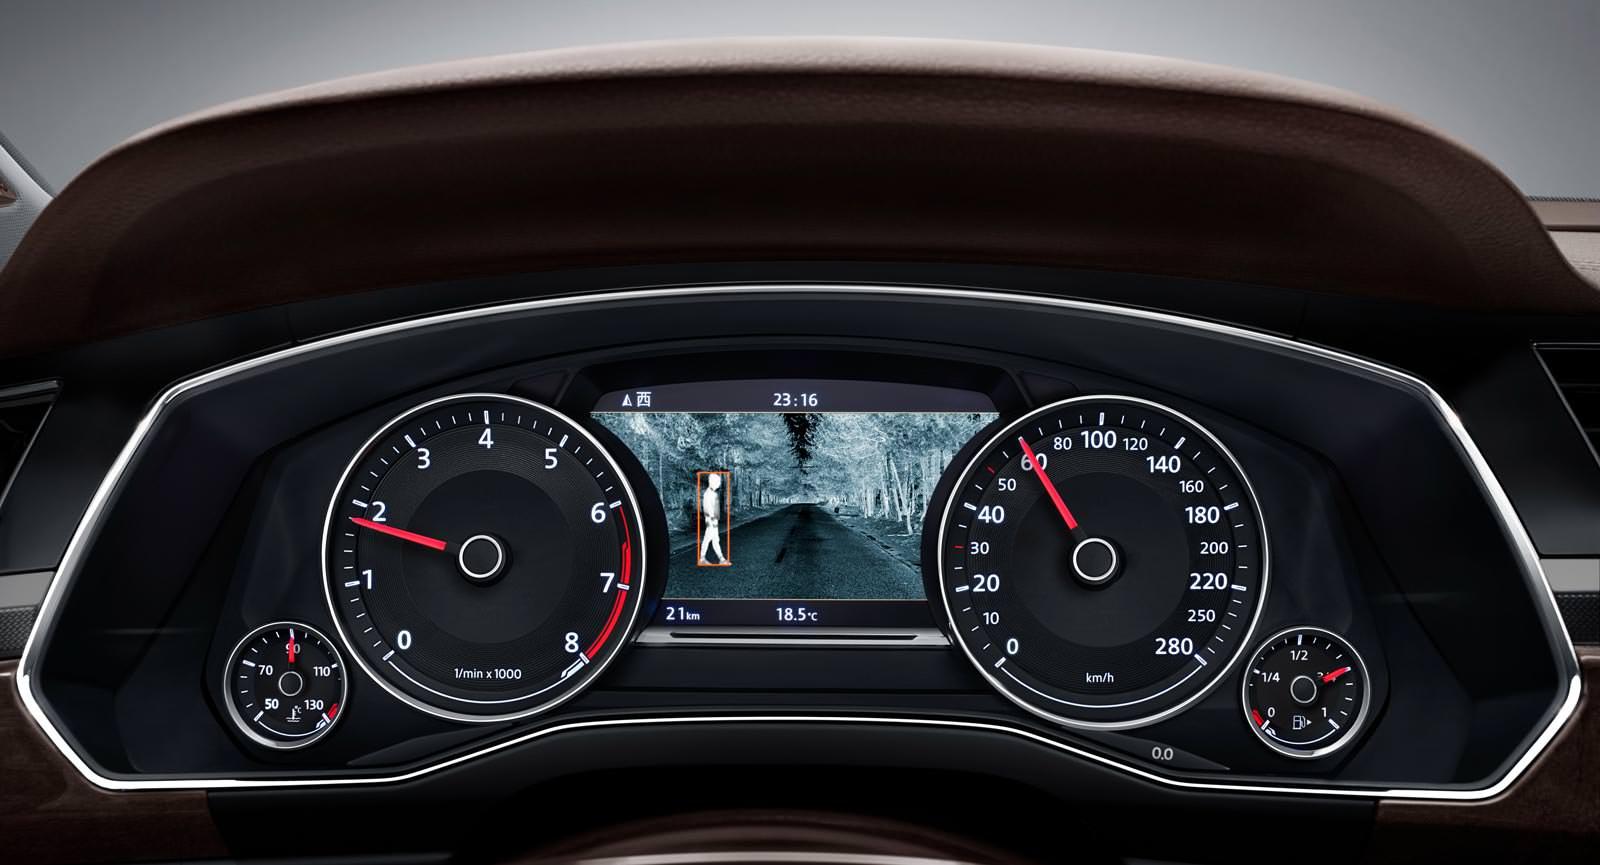 Цифровая приборная панель Volkswagen Phideon